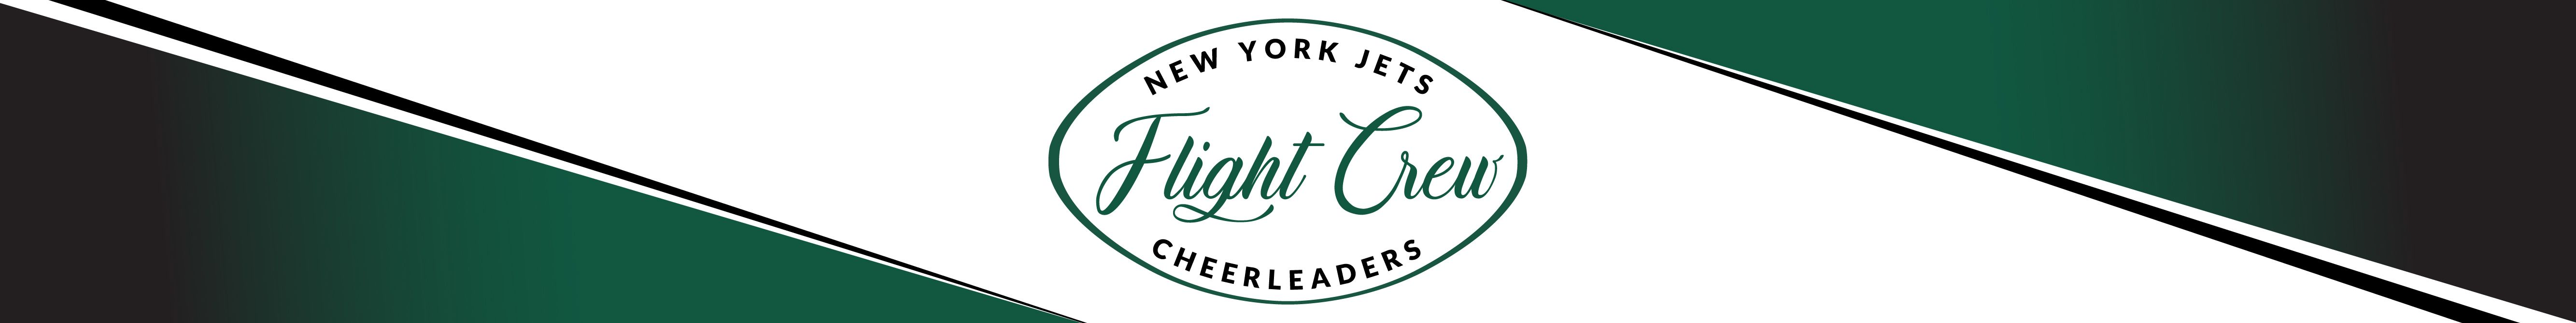 flight crew banner-new logo 2019-01